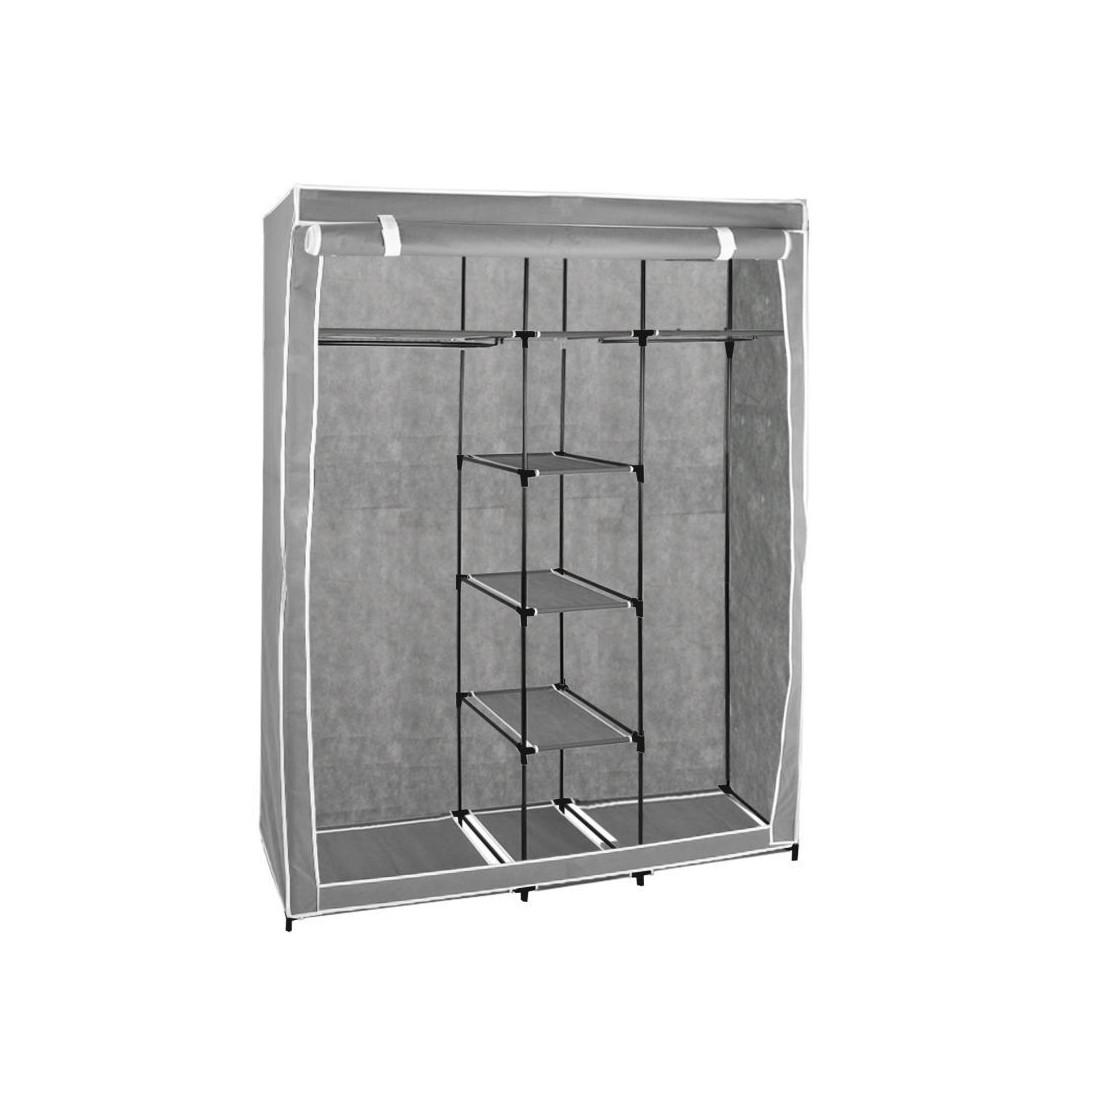 Comprar armario auxiliar plegable y portátil 140x167 cm